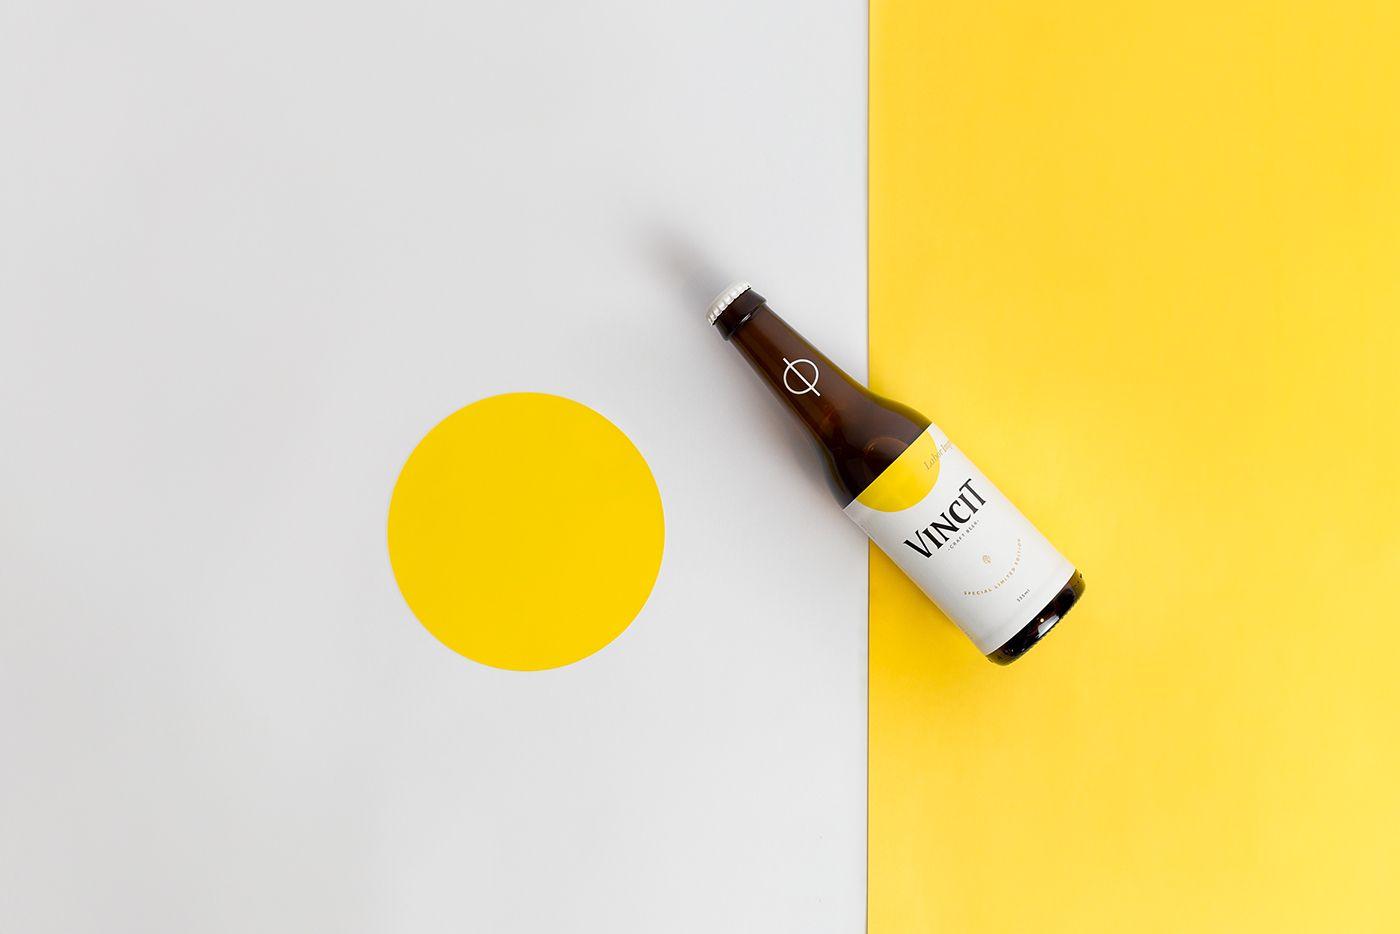 Vincit Beer - Special Limited Edition on Behance